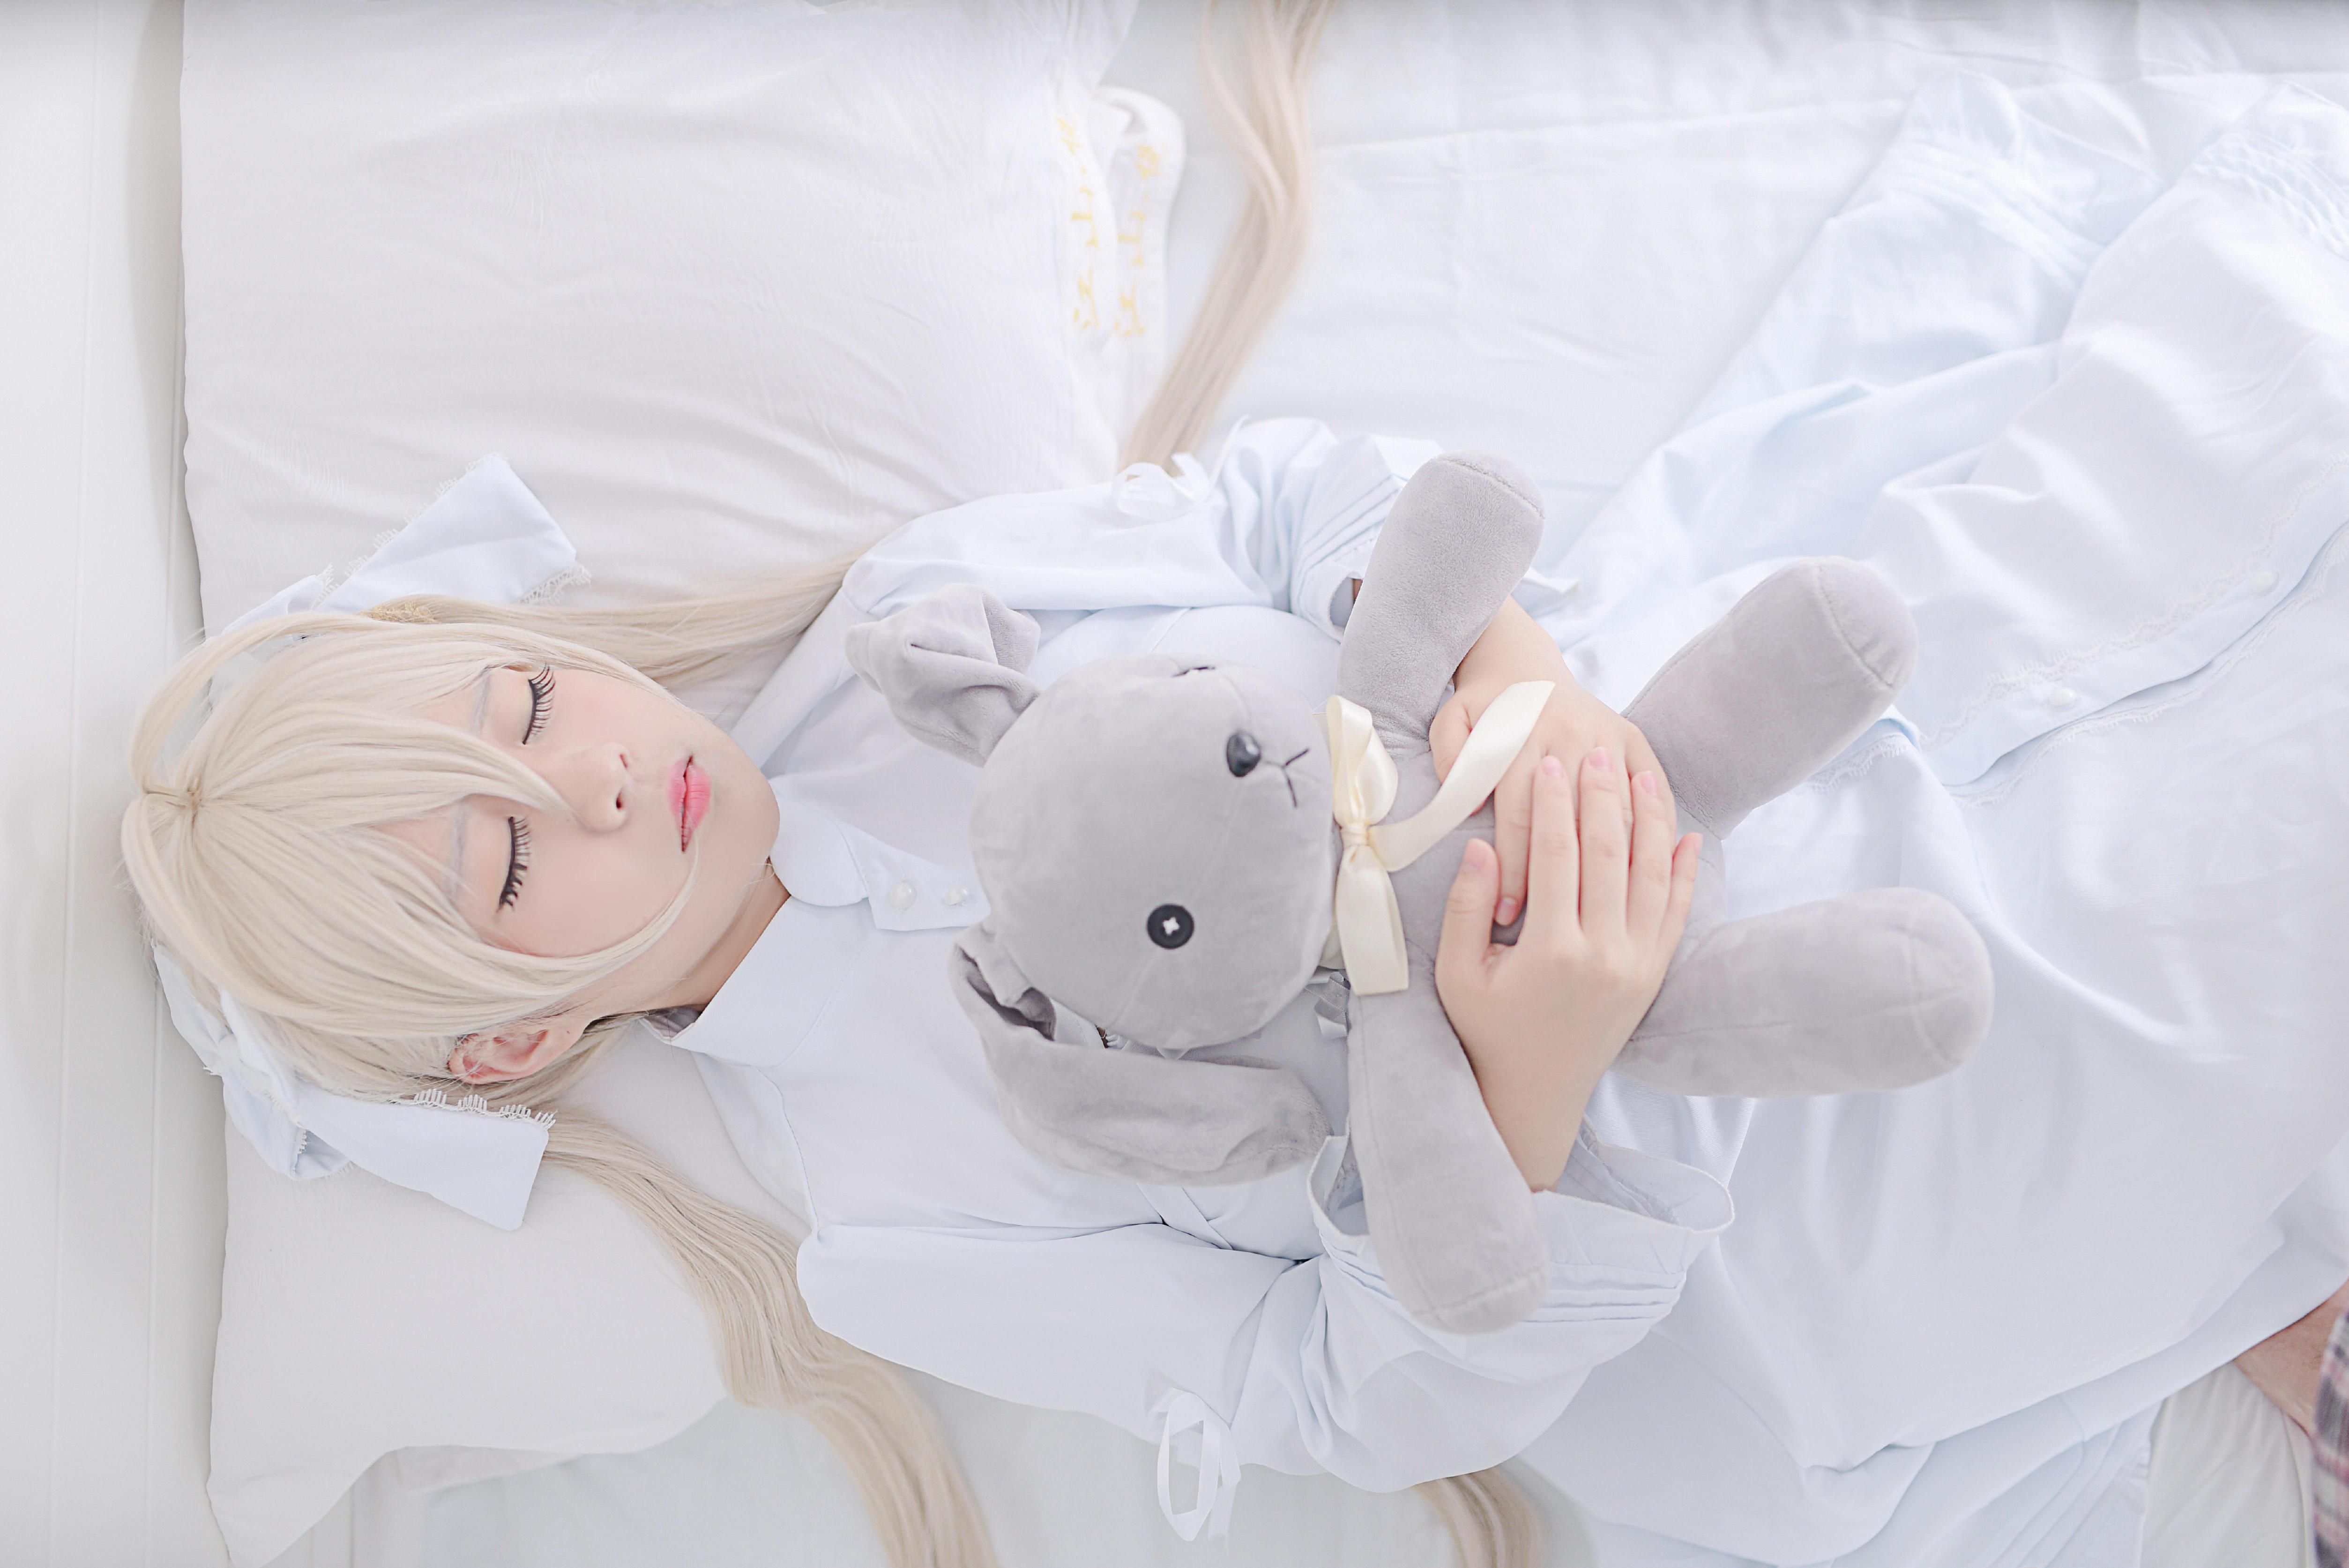 【Cosplay欣赏】缘之空 恨妹不成穹 COSPLAY 第6张